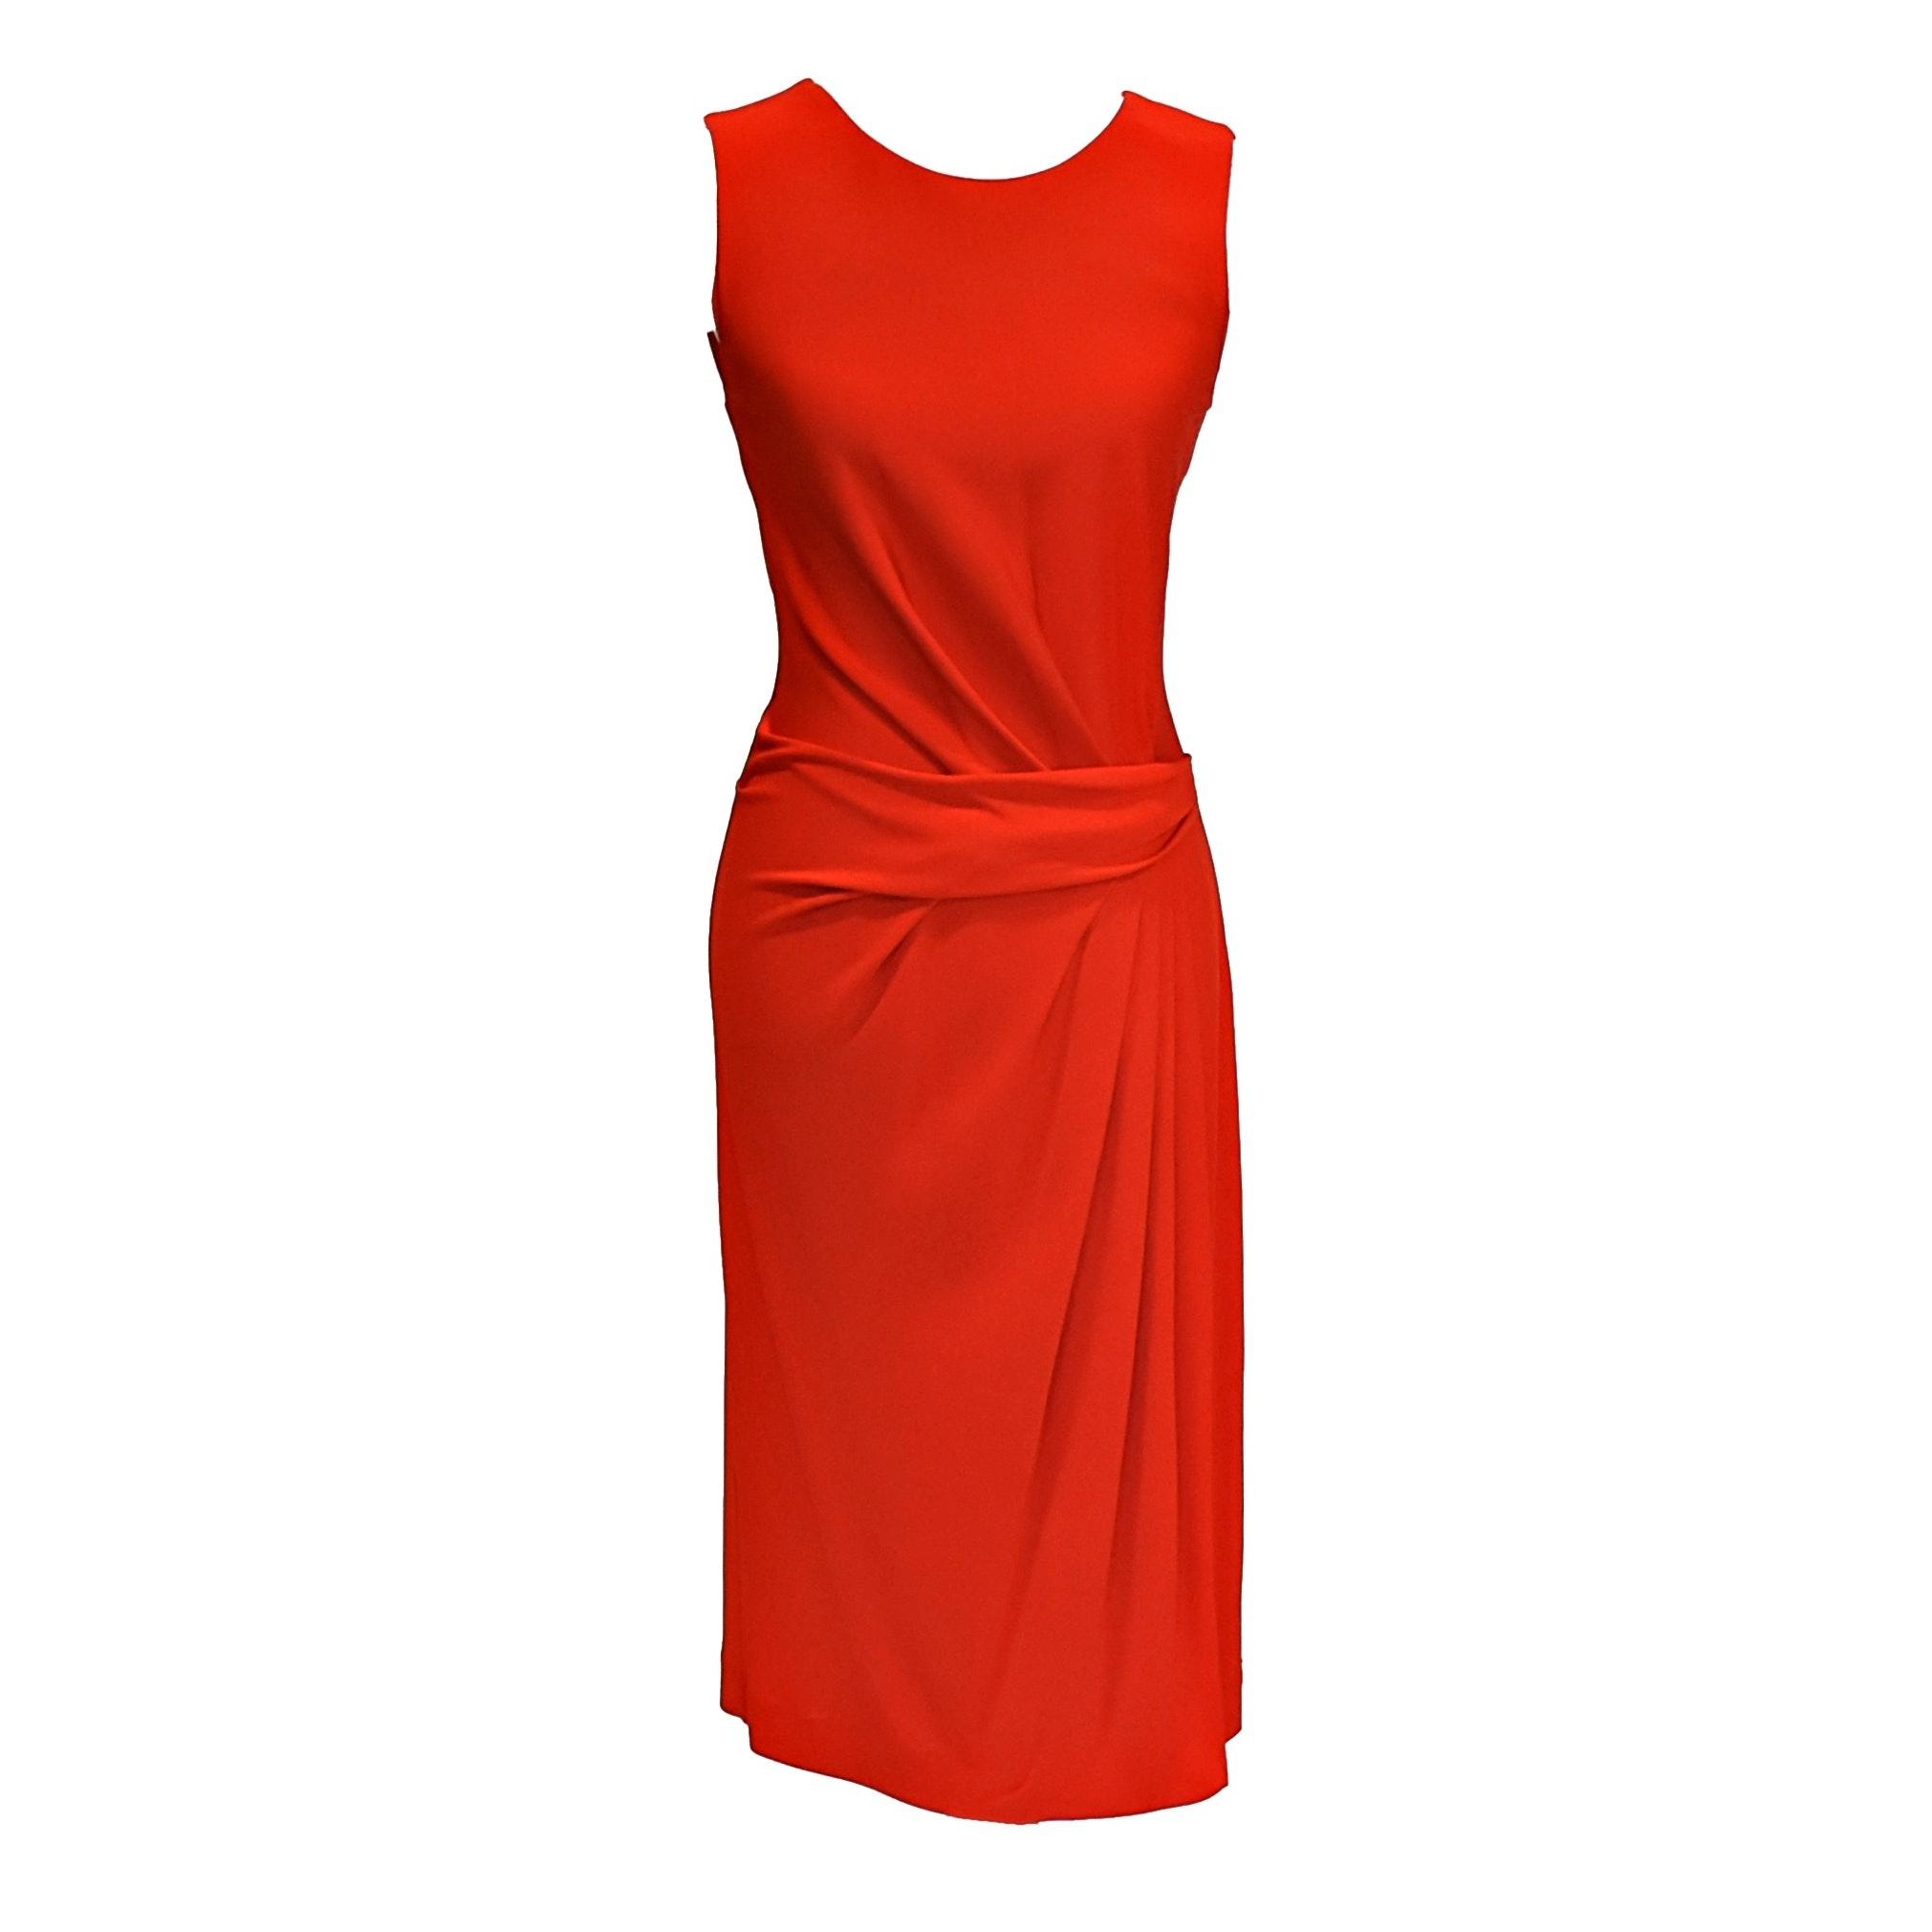 Red Sleeveless Ferragamo Dress with Draped Waist